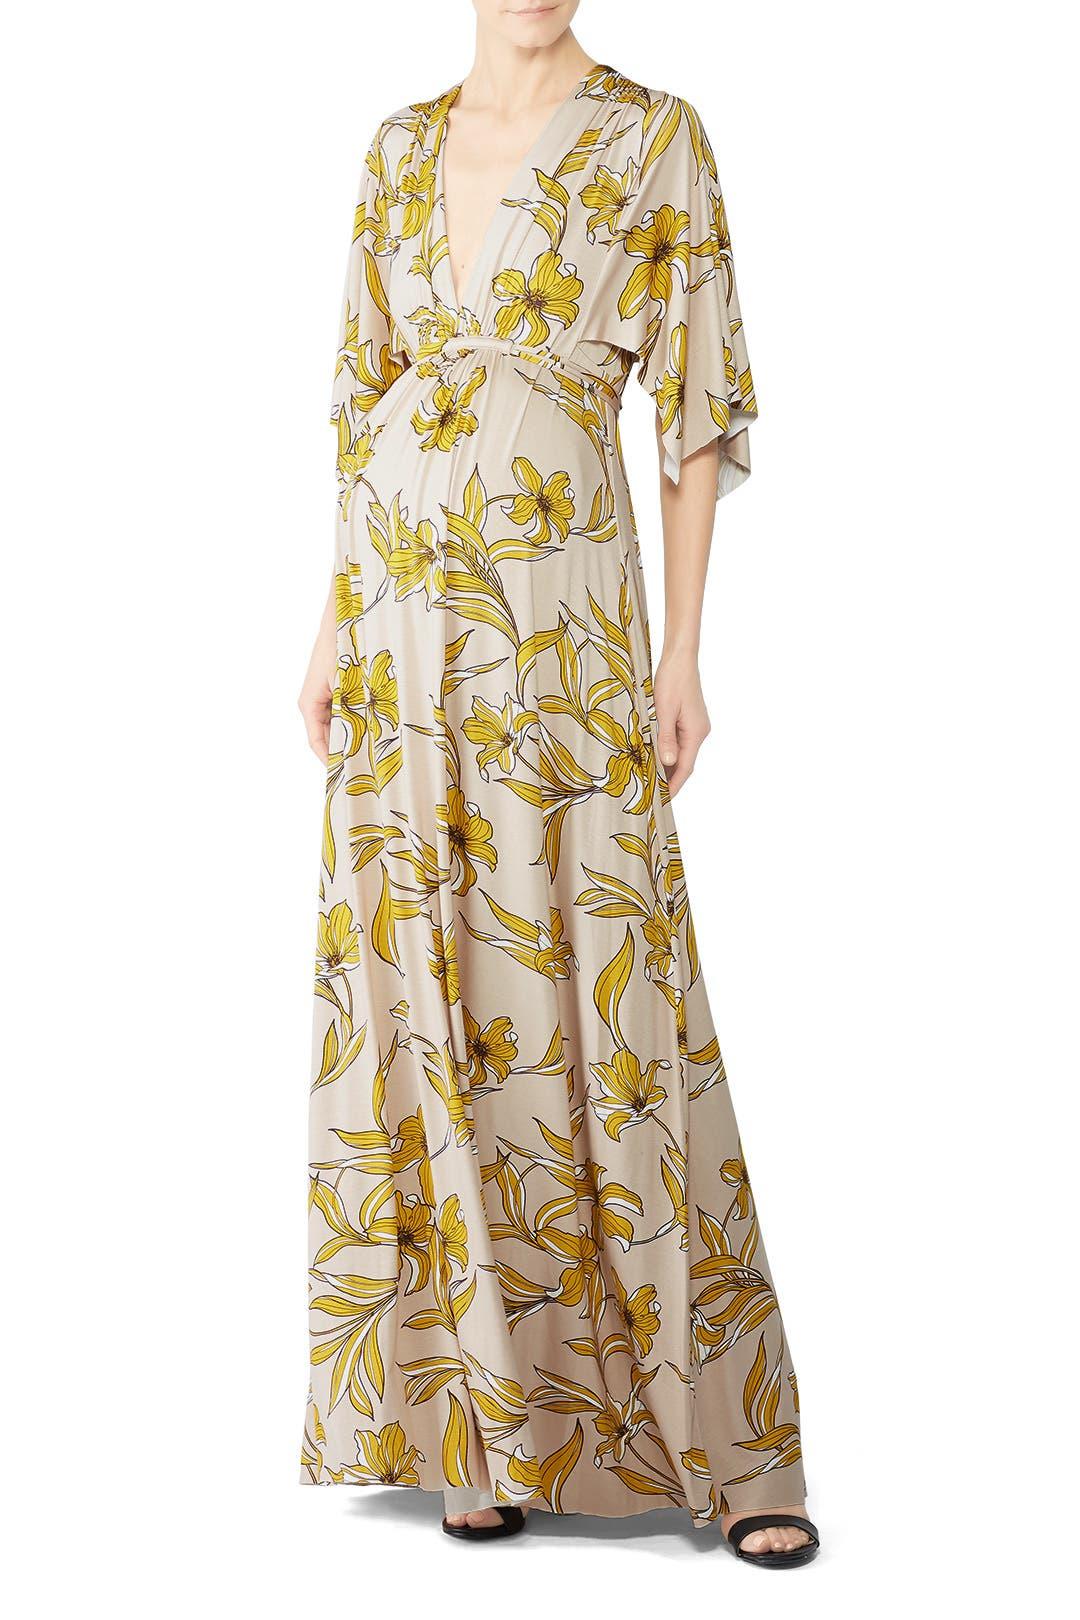 ff9bc89ebac7 Rachel Pally. Read Reviews. Floral Caftan Maternity Dress